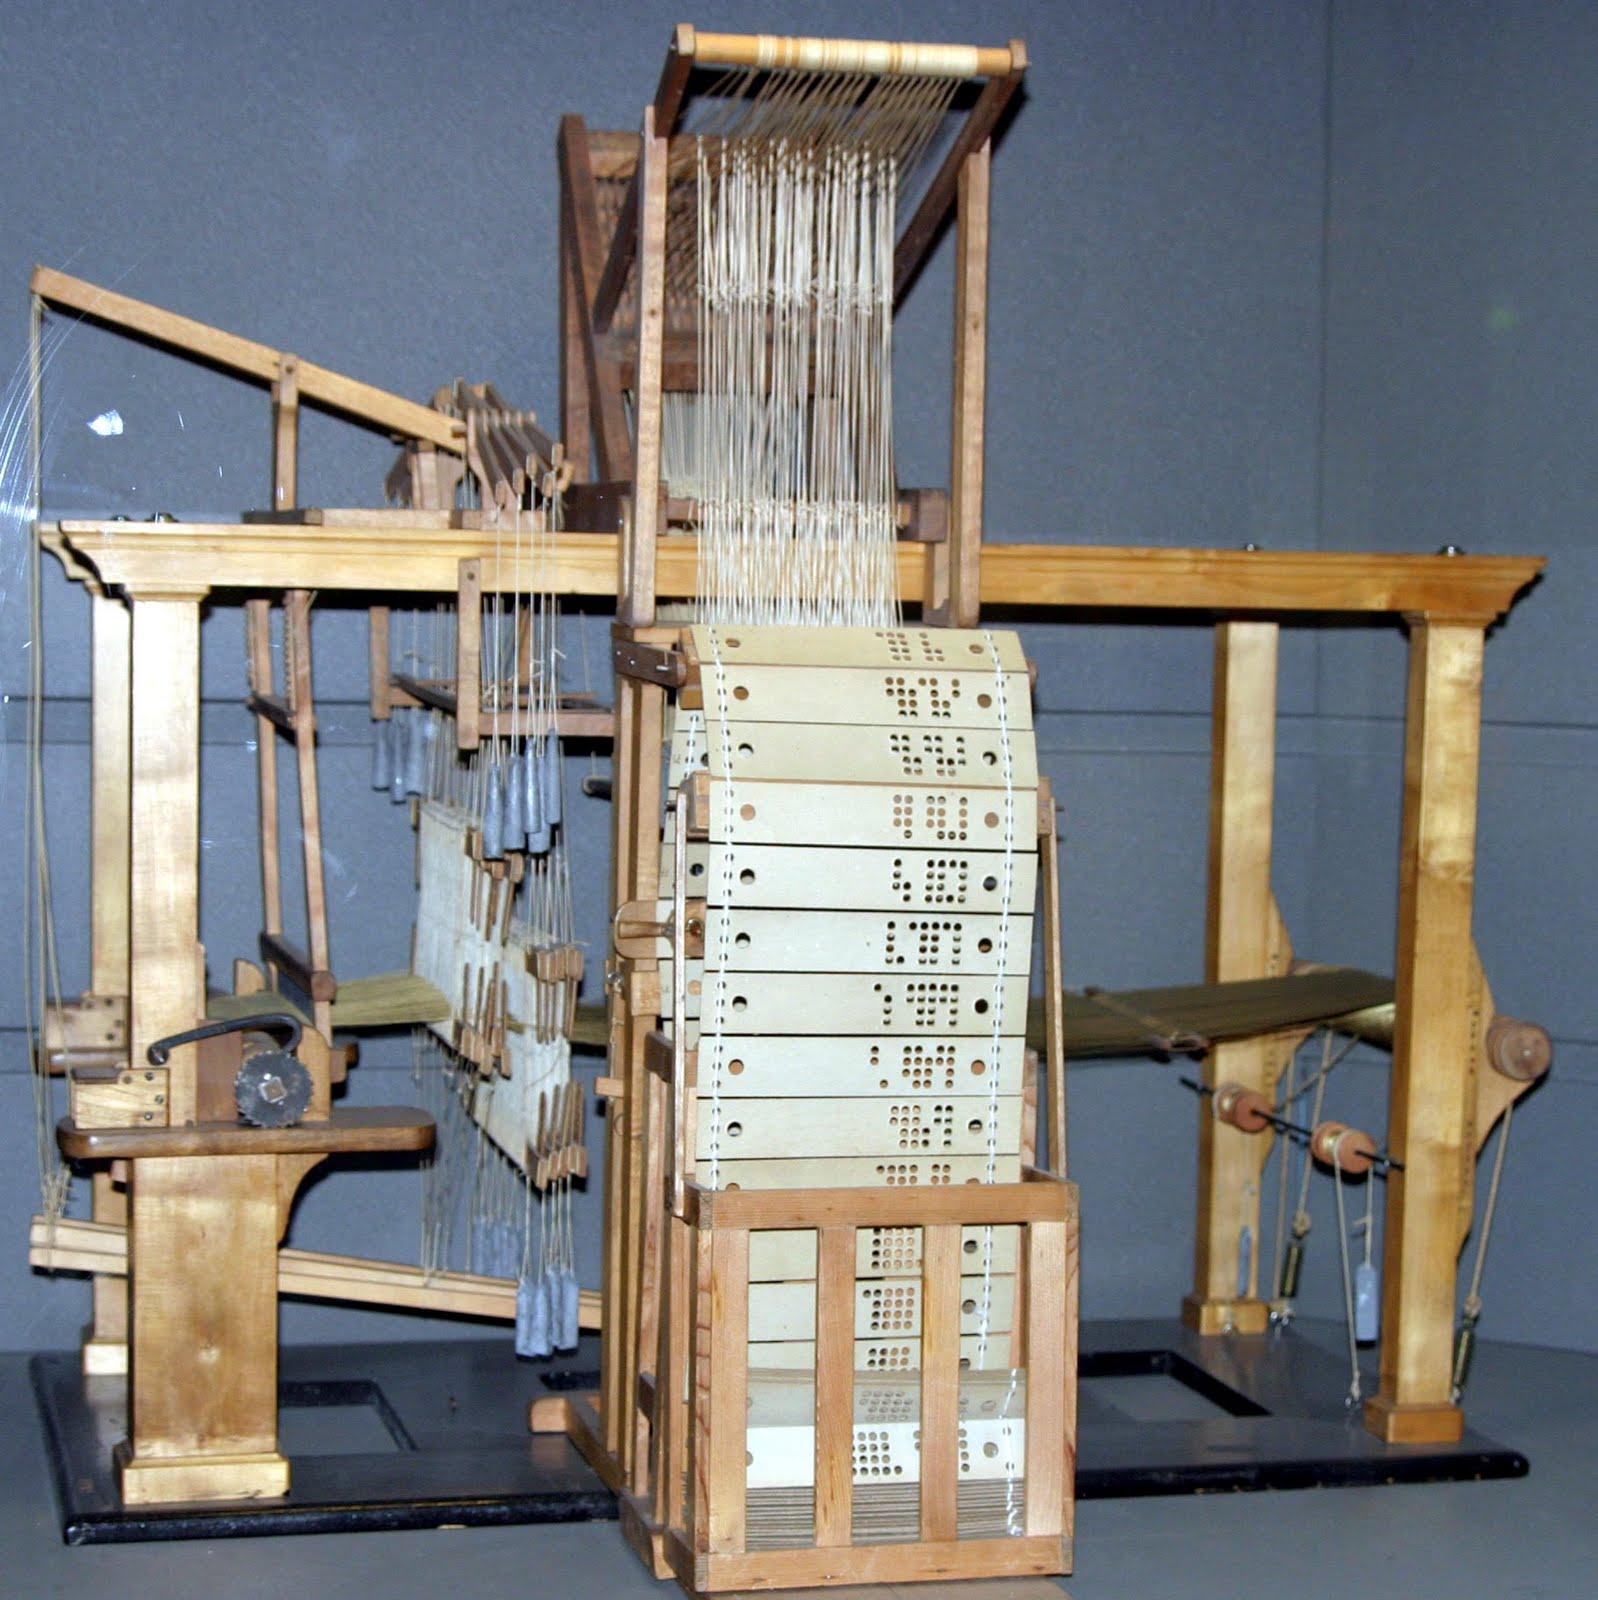 The Jacquard Loom